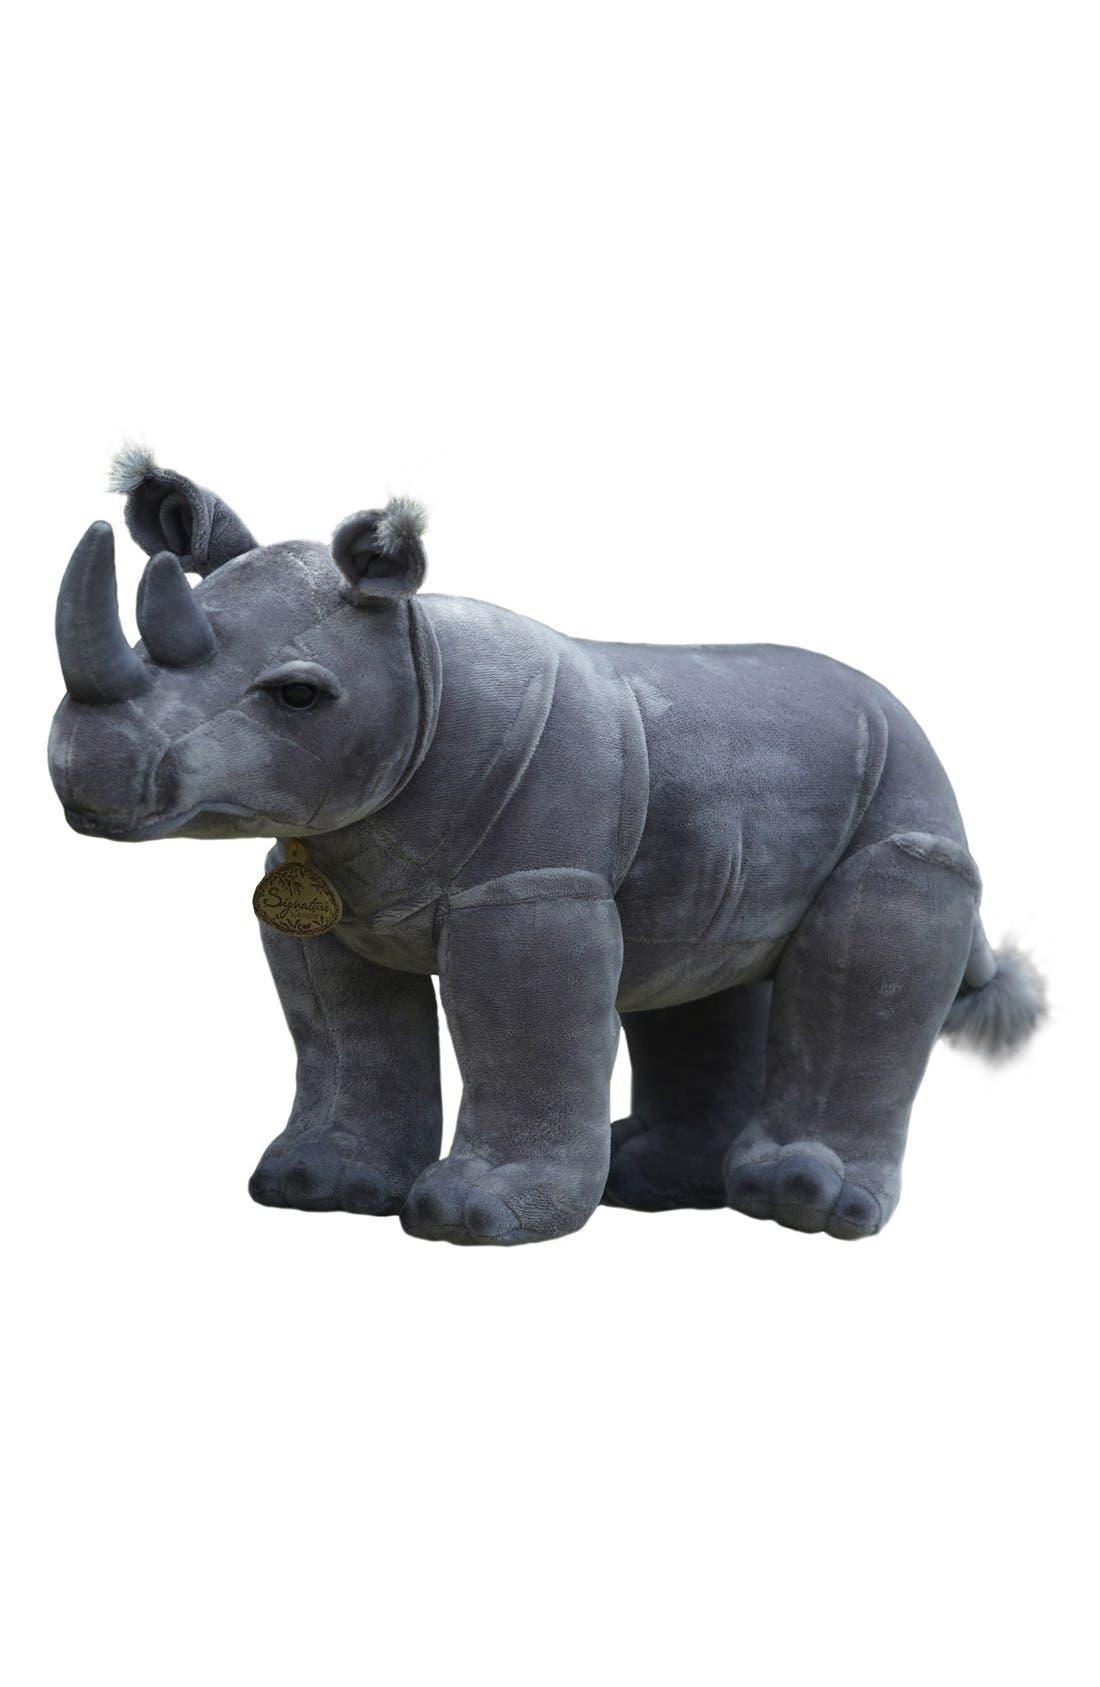 AURORA WORLD TOYS 'Black Rhinoceros' Stuffed Animal